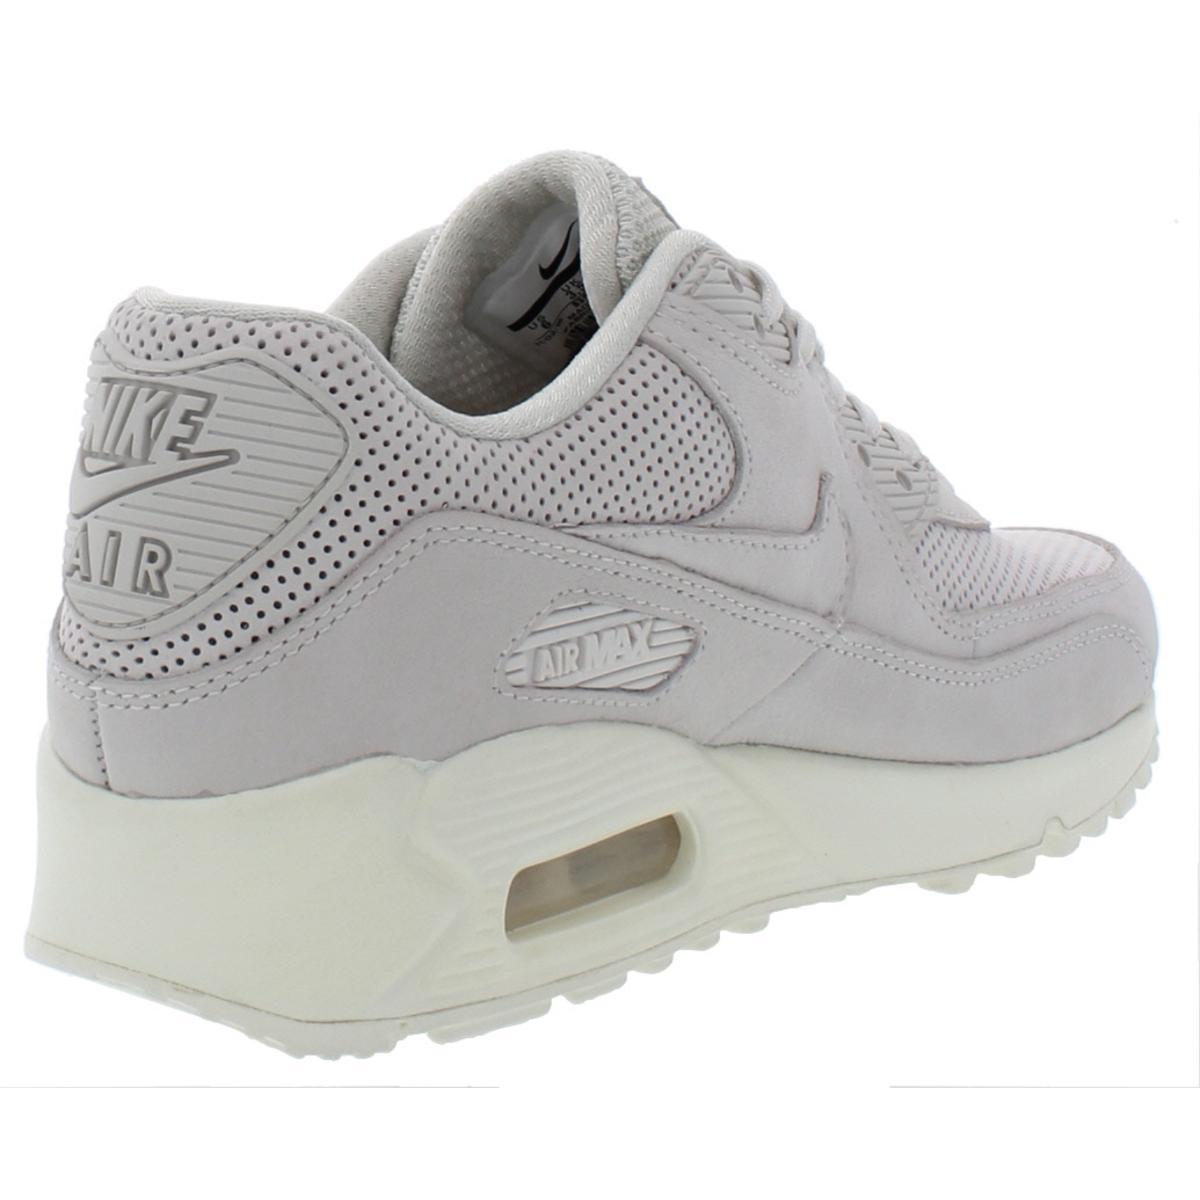 Nike-Womens-Air-Max-90-Pinnacle-Suede-Low-Top-Fashion-Sneakers-Shoes-BHFO-4140 thumbnail 6